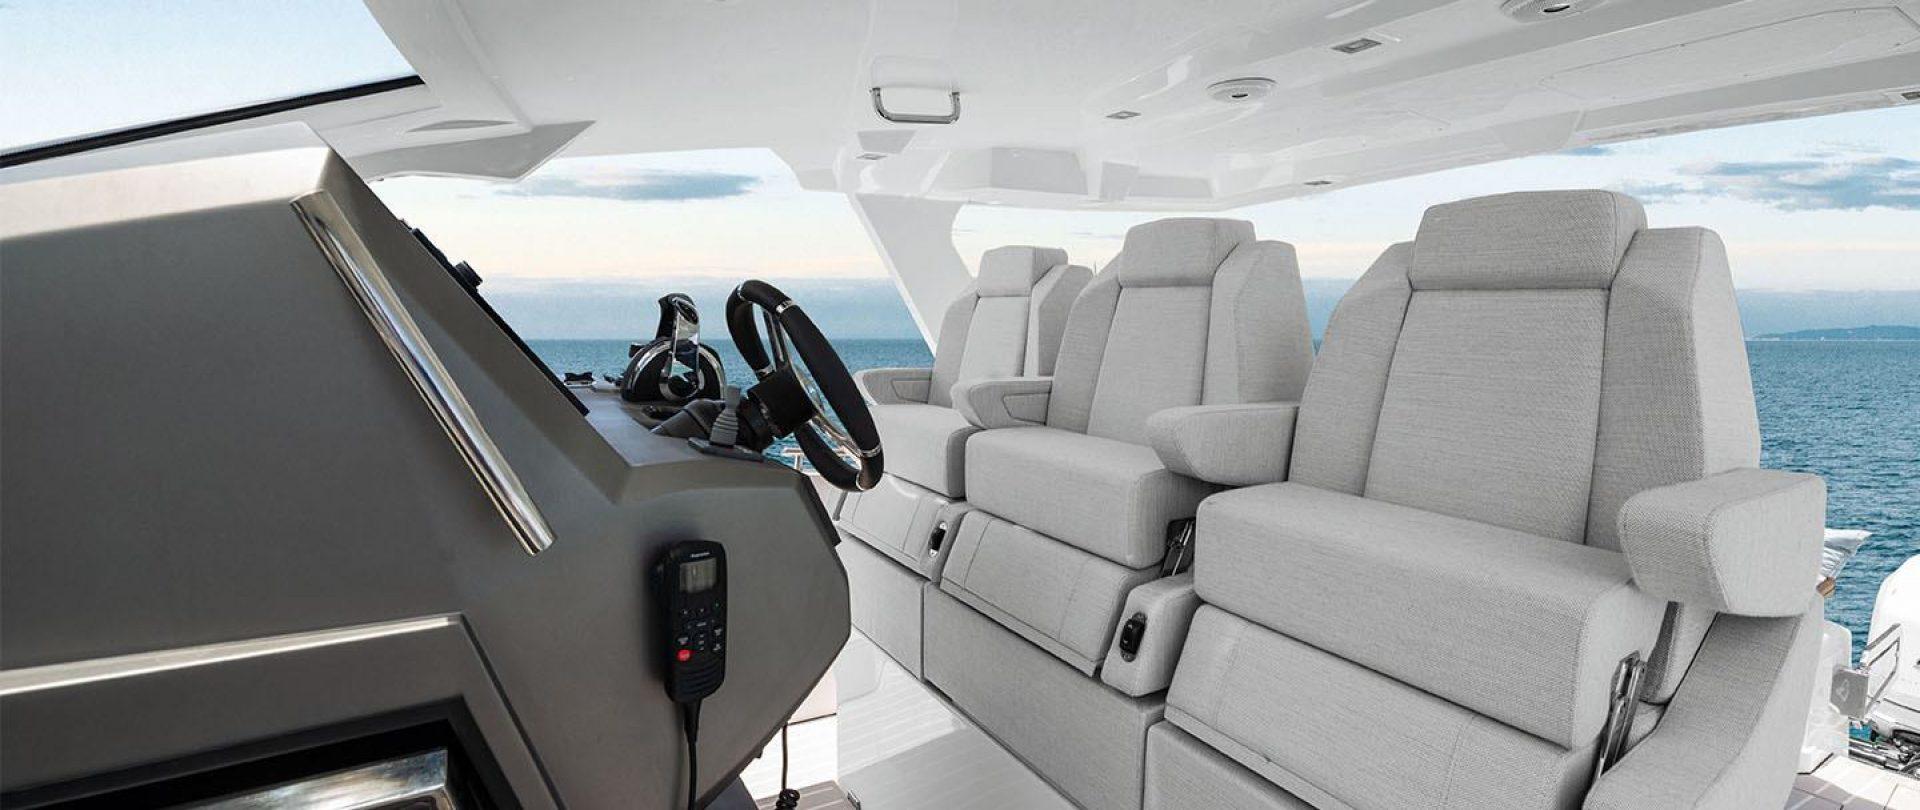 93_20190211122626_verve40__0014_verve_40_console_seats